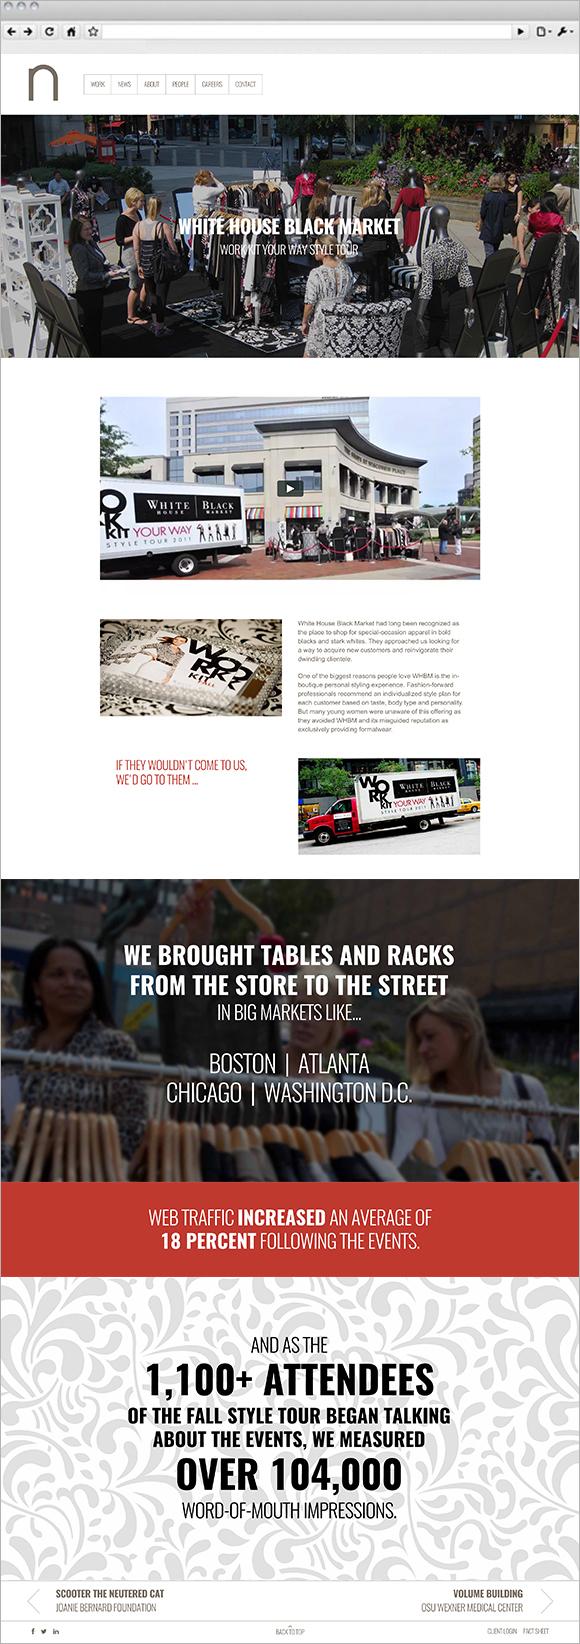 northlich.com case study white house black market